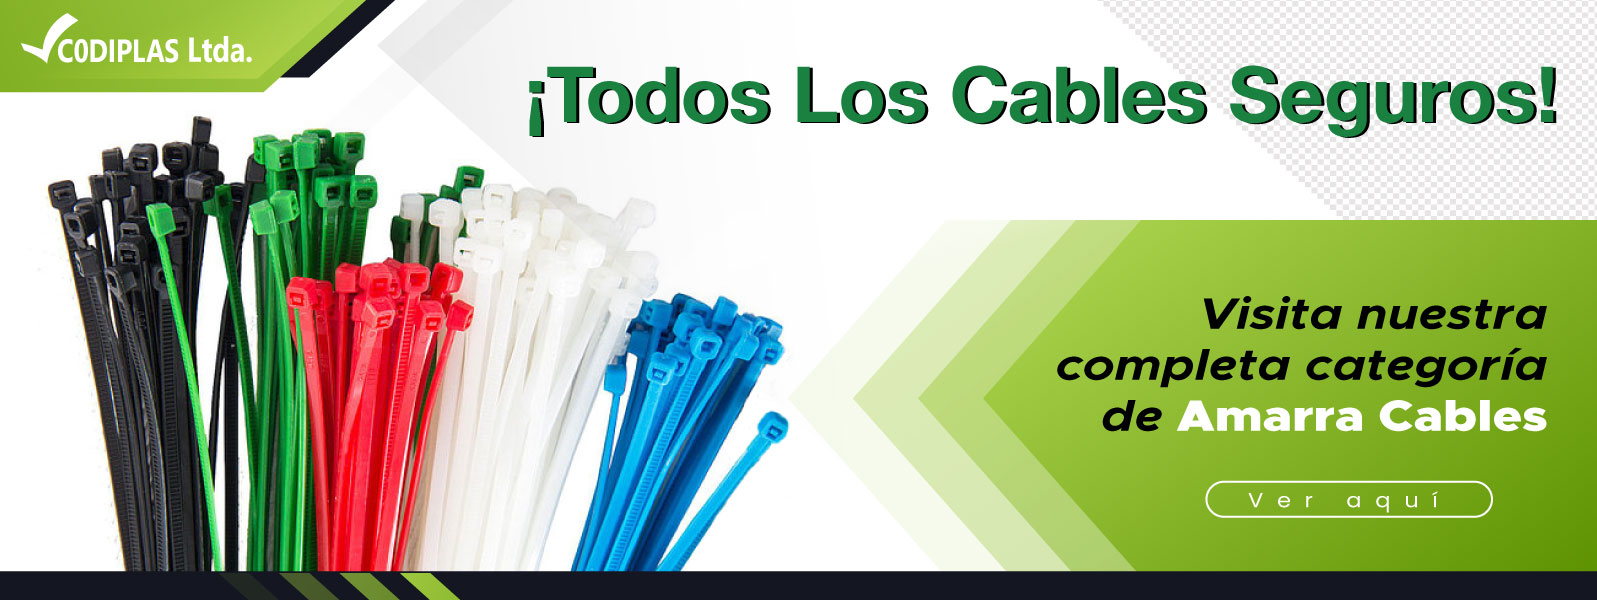 slider_amarra_cables_codiplas_1597x600